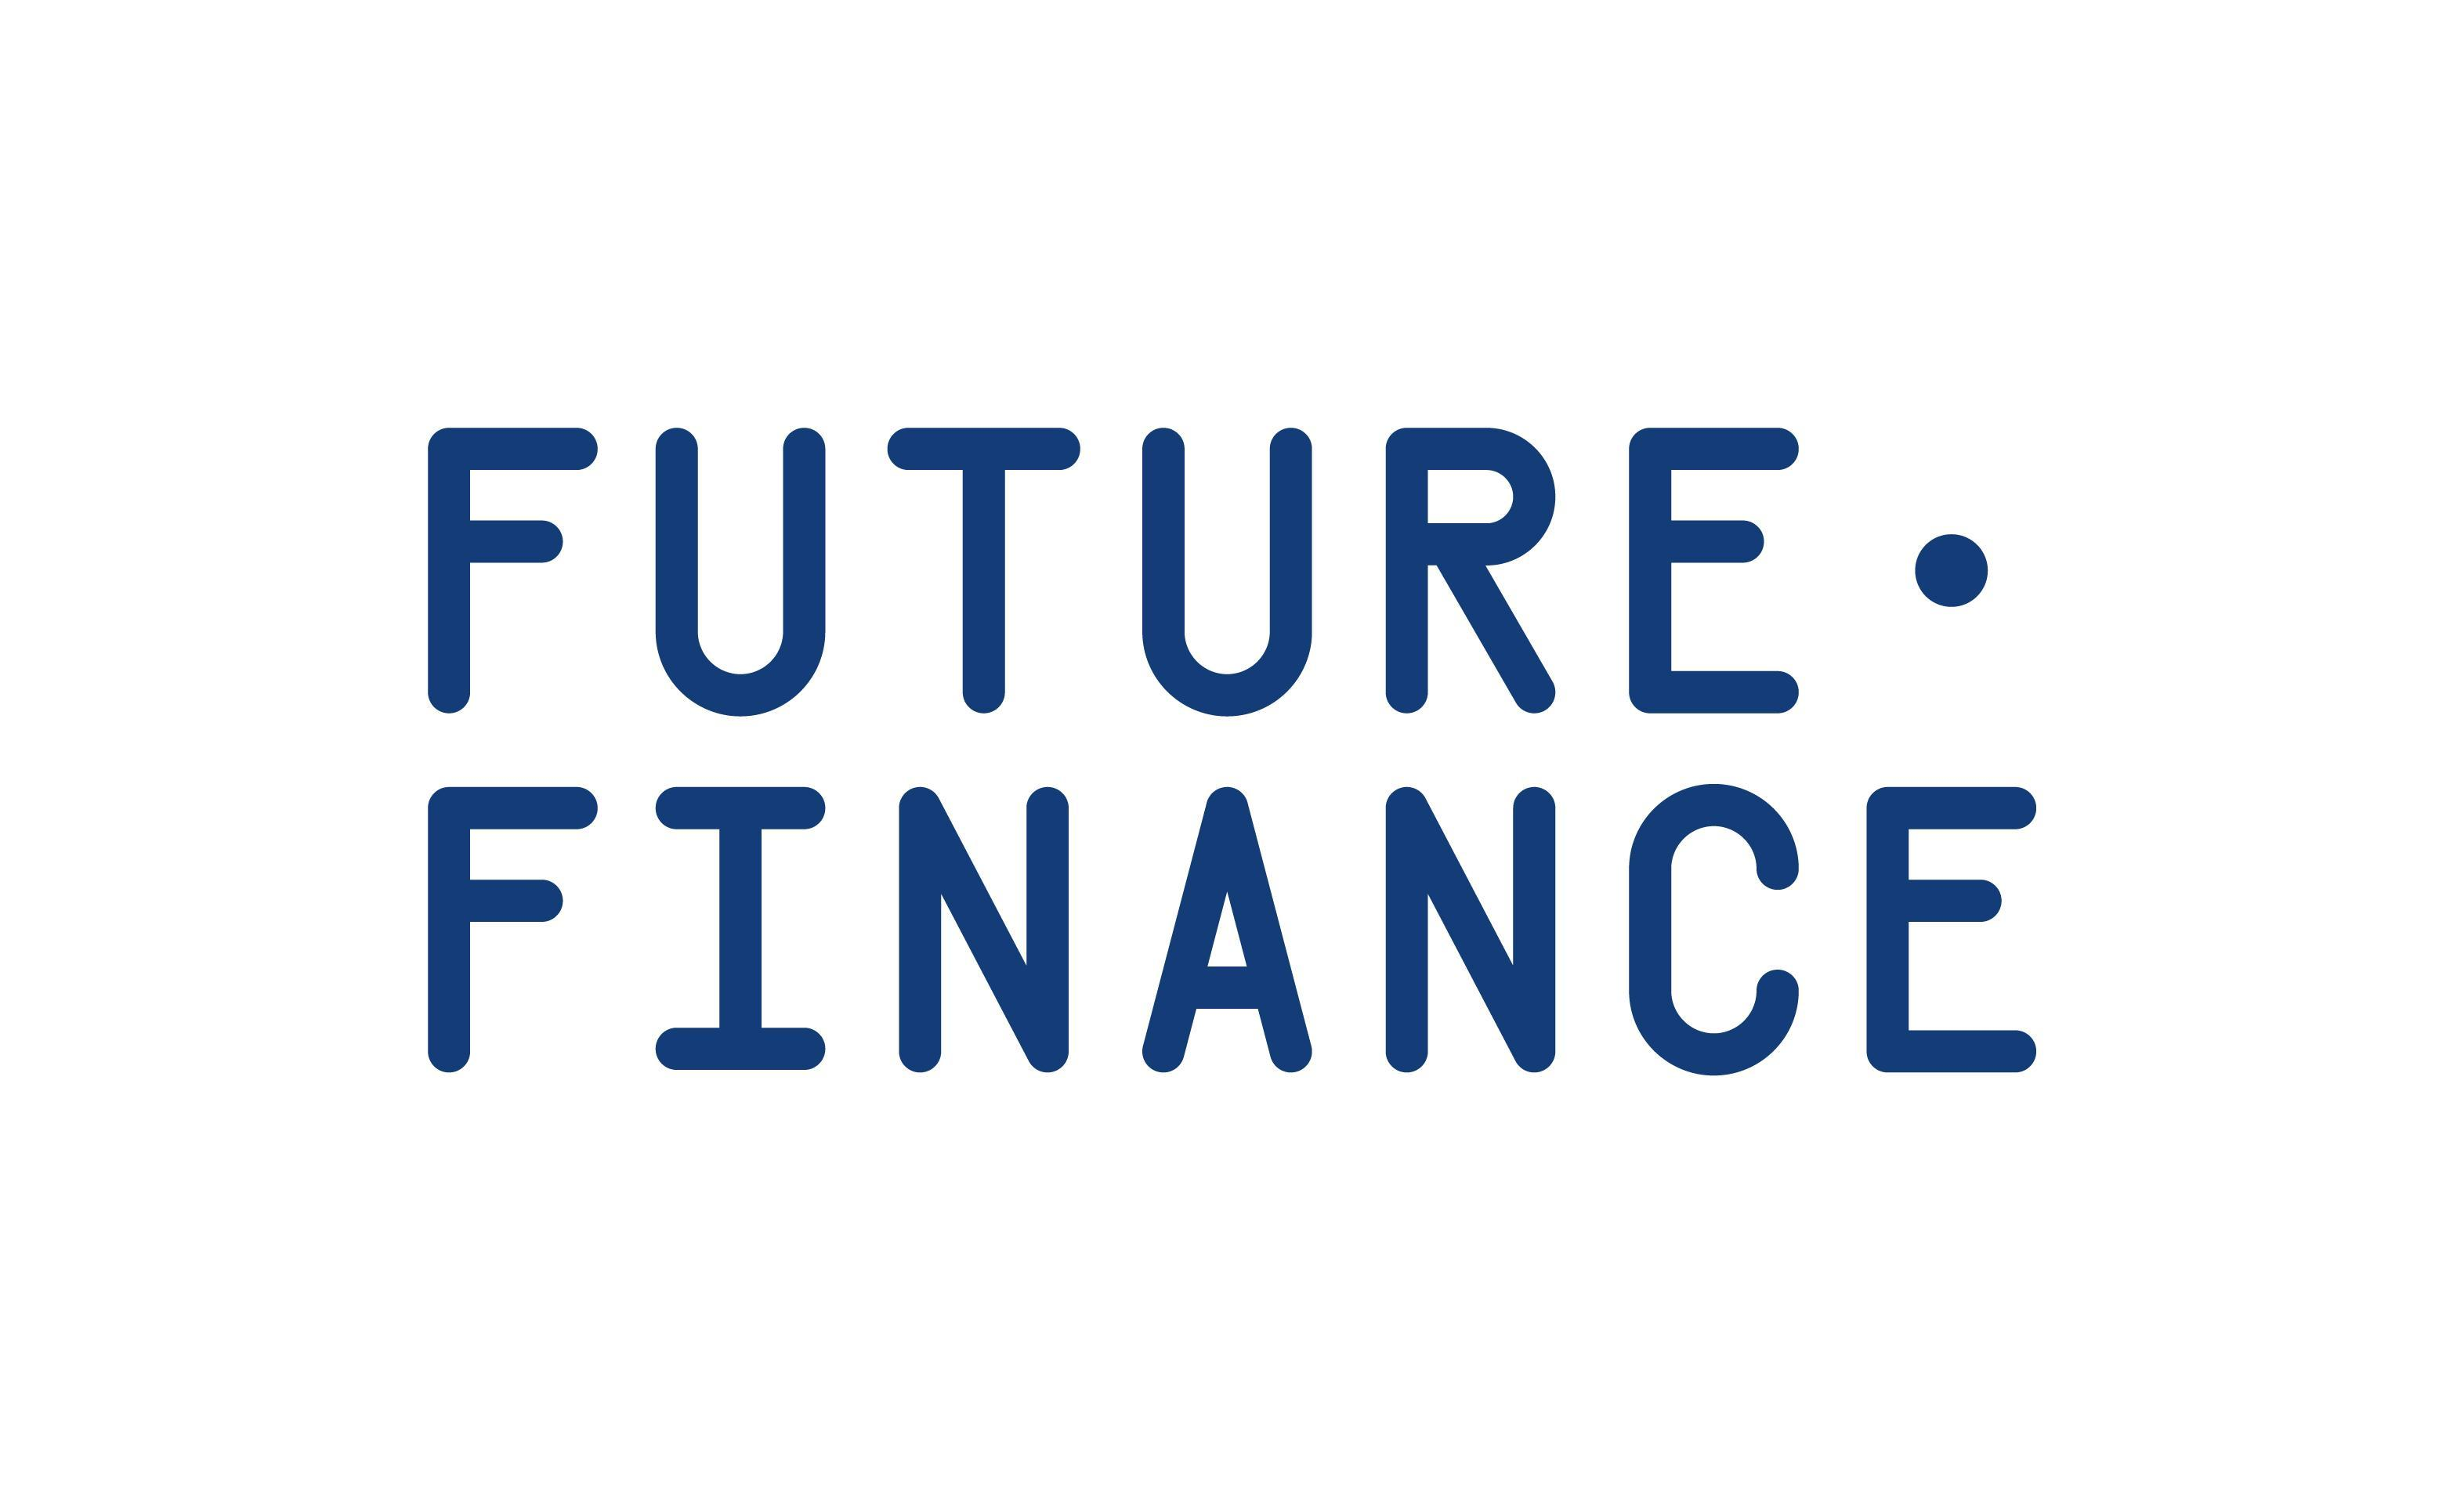 Future Finance company logo